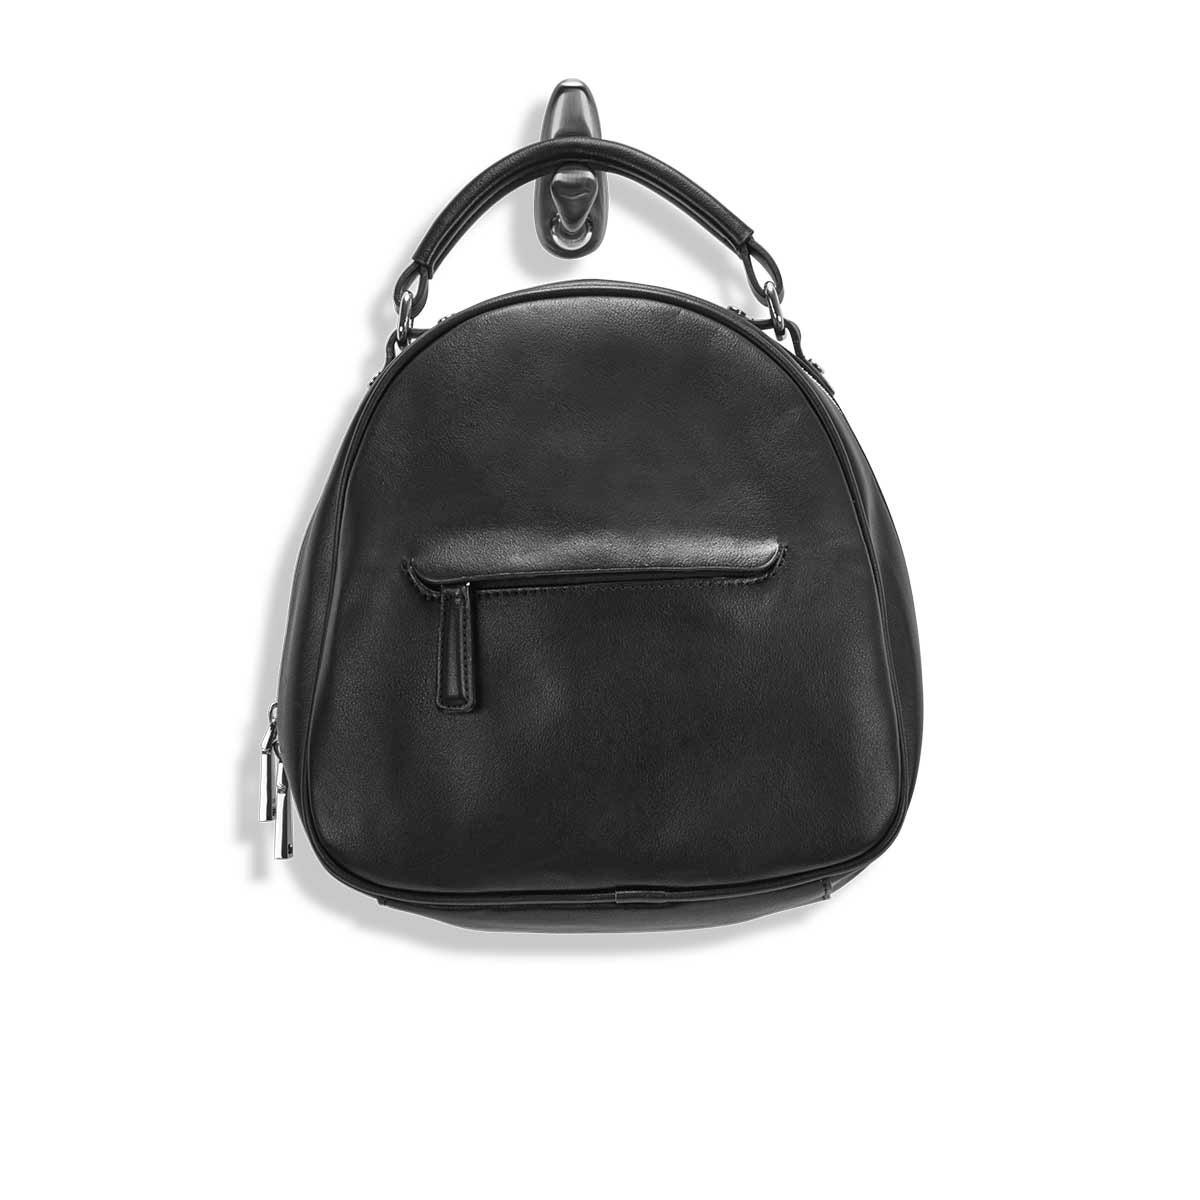 Lds Mattie black dome backpack